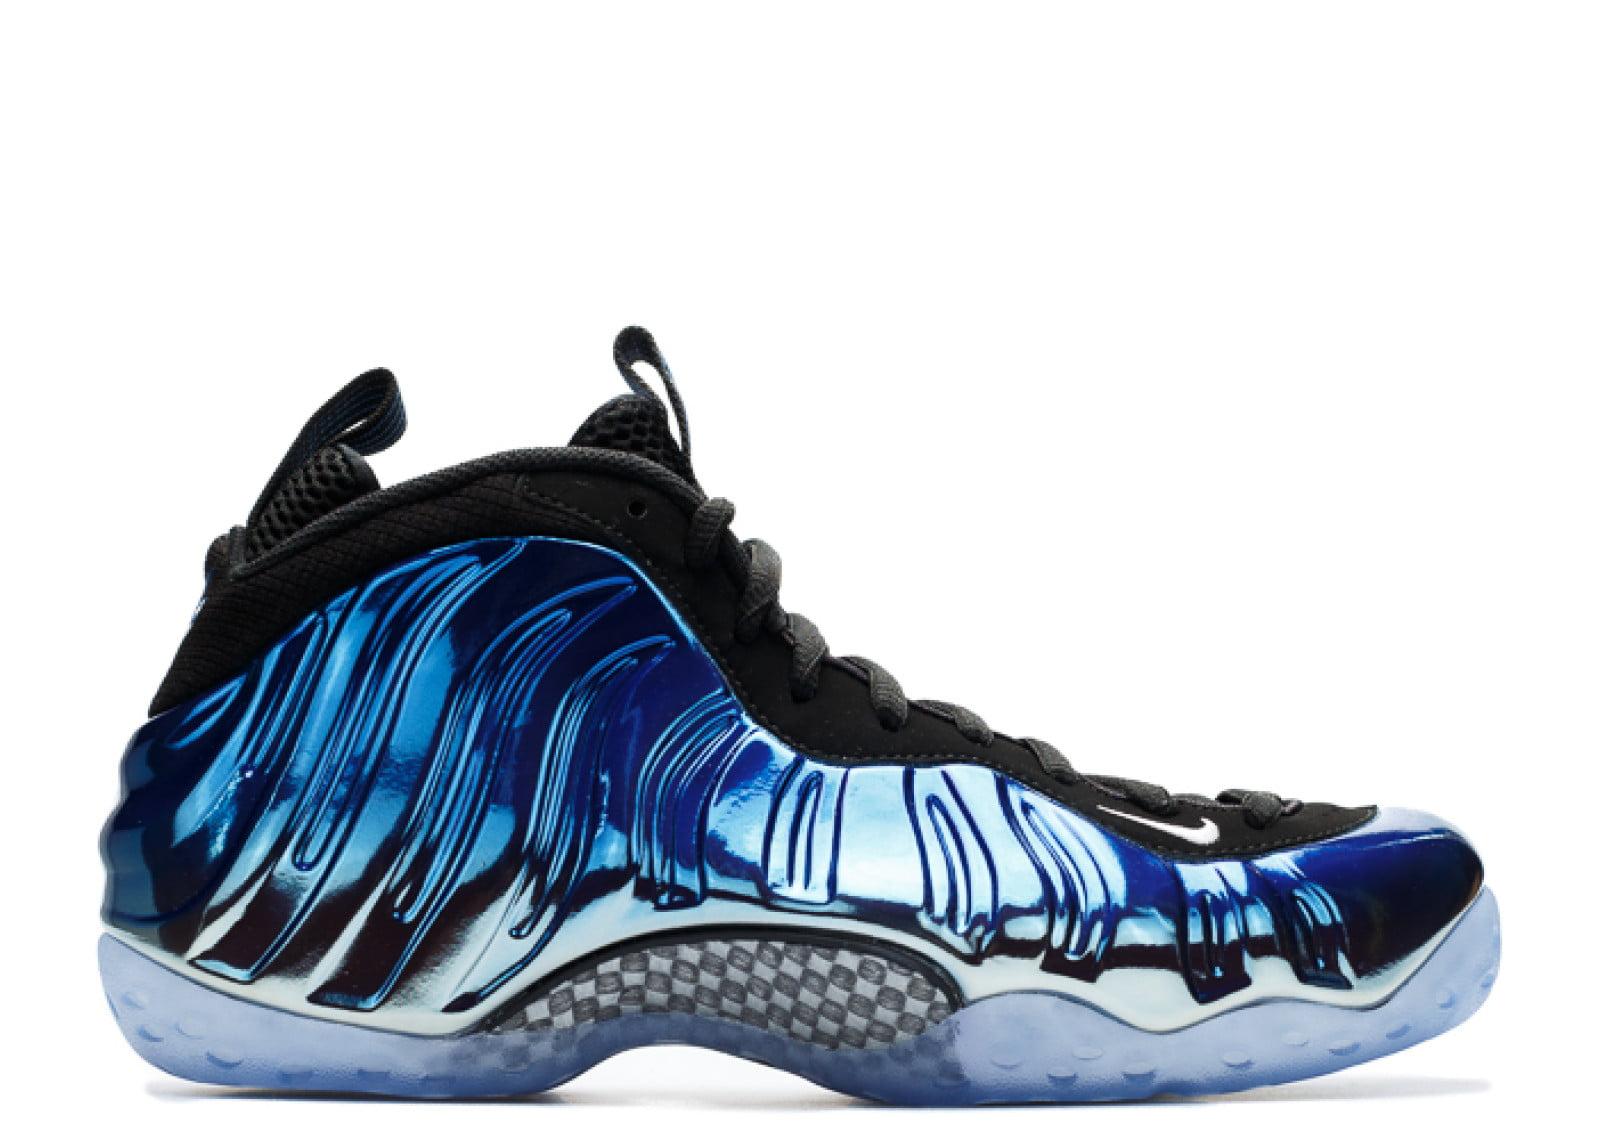 san francisco ed4ab 9661e Nike - Men - Nike Air Foamposite One Prm 'Blue Mirror' - 575420-008 - Size 9